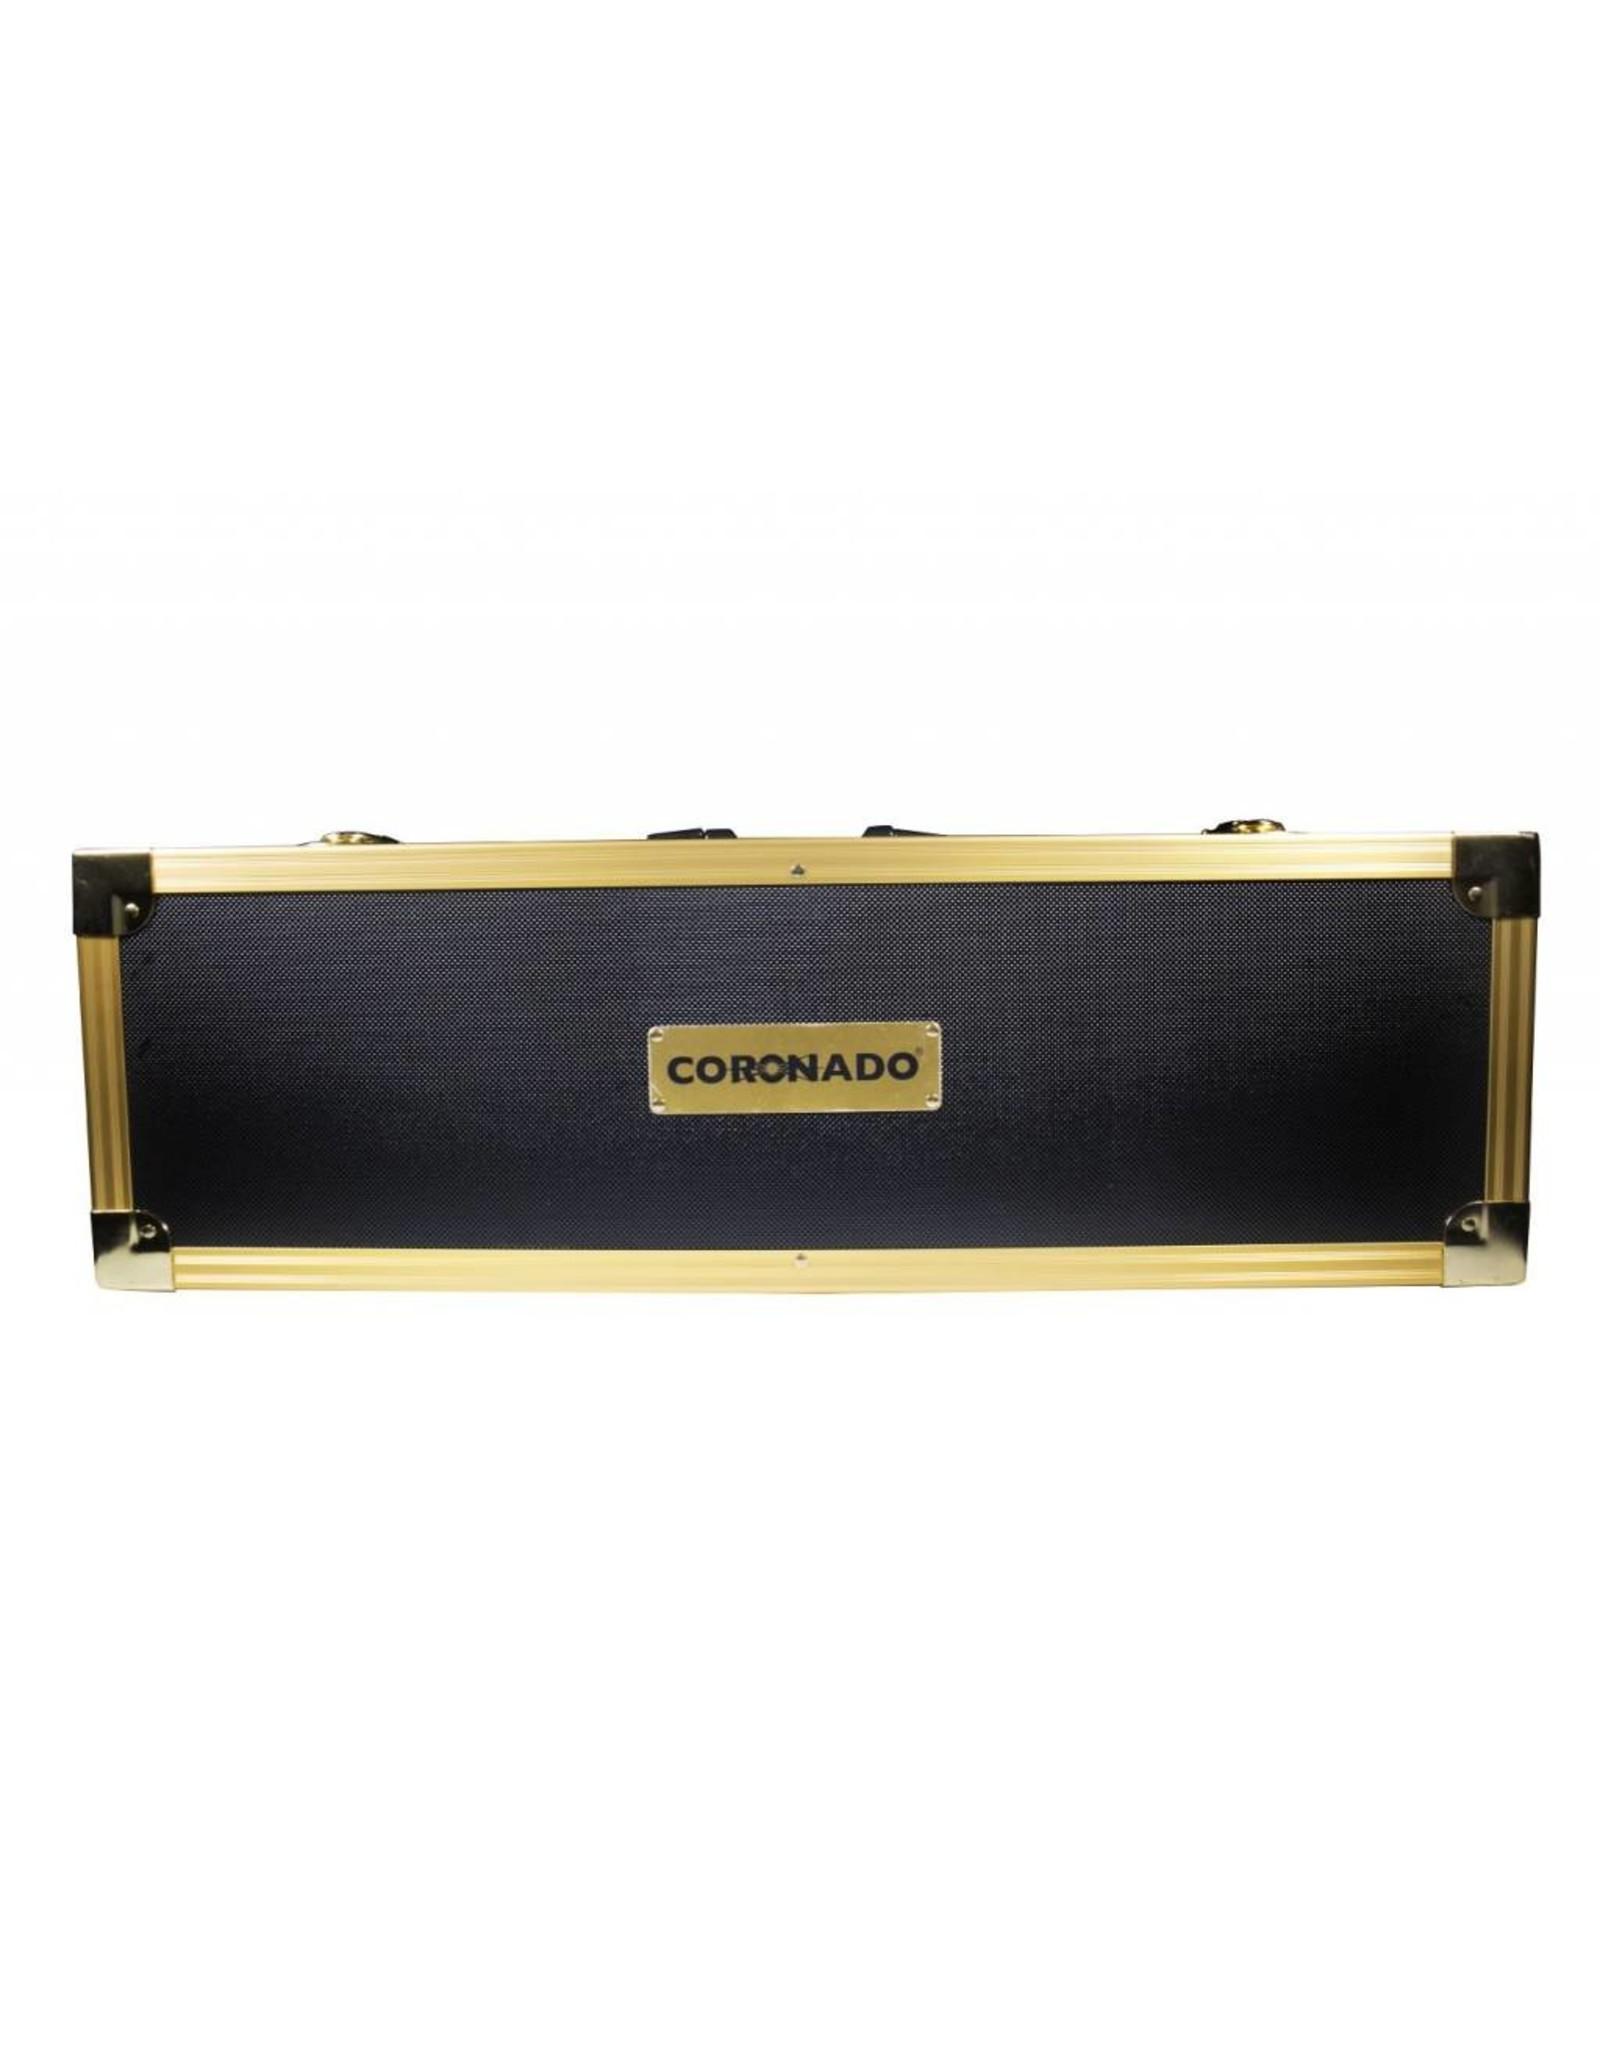 Coronado Coronado Solarmax III 70mm Scope with BF10 Blocking Filter & case